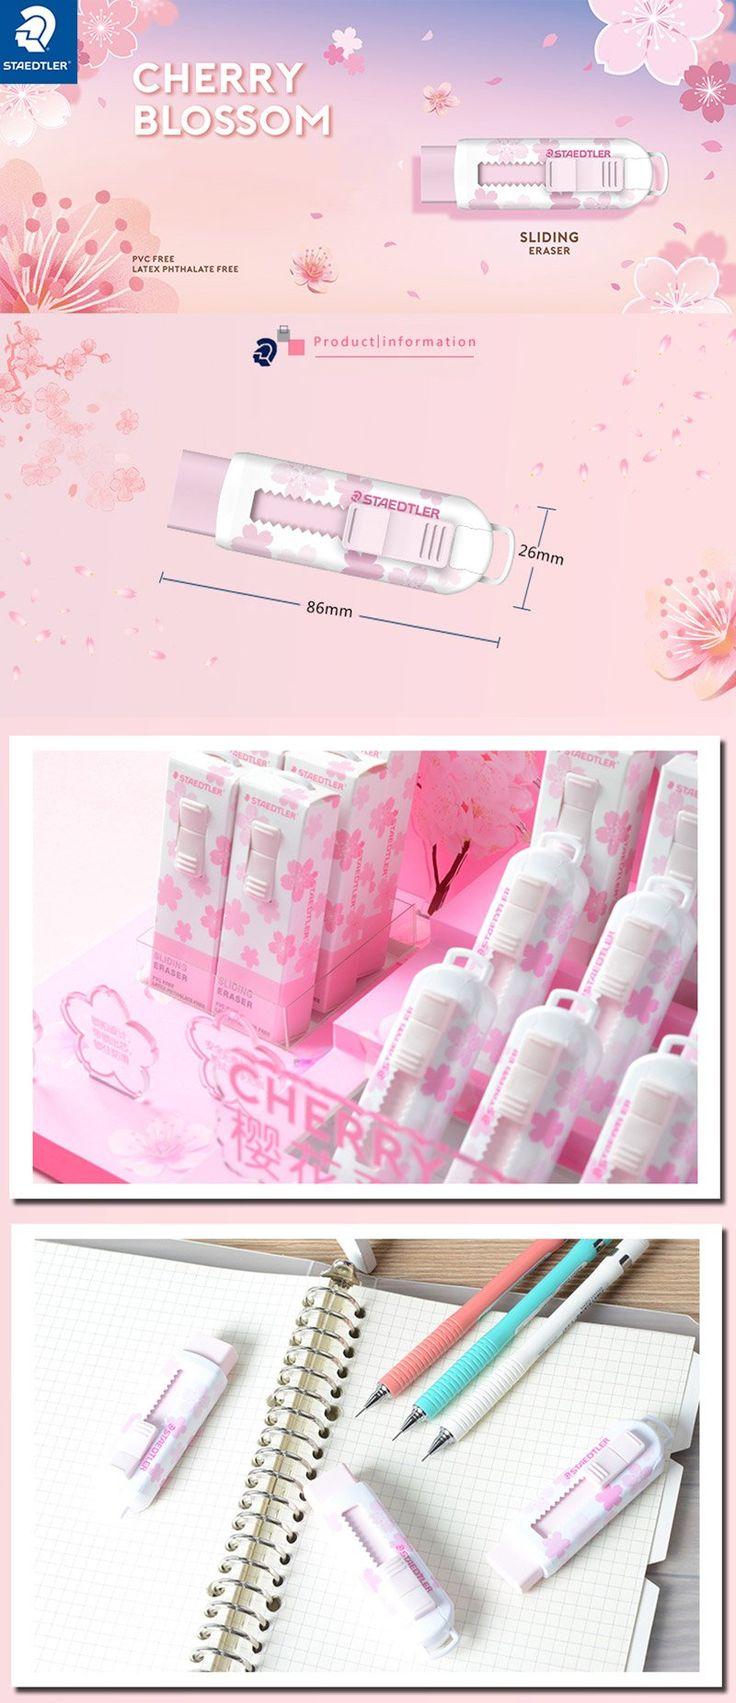 Sakura Pink (Limited) Staedtler Pastel Eraser with Sliding